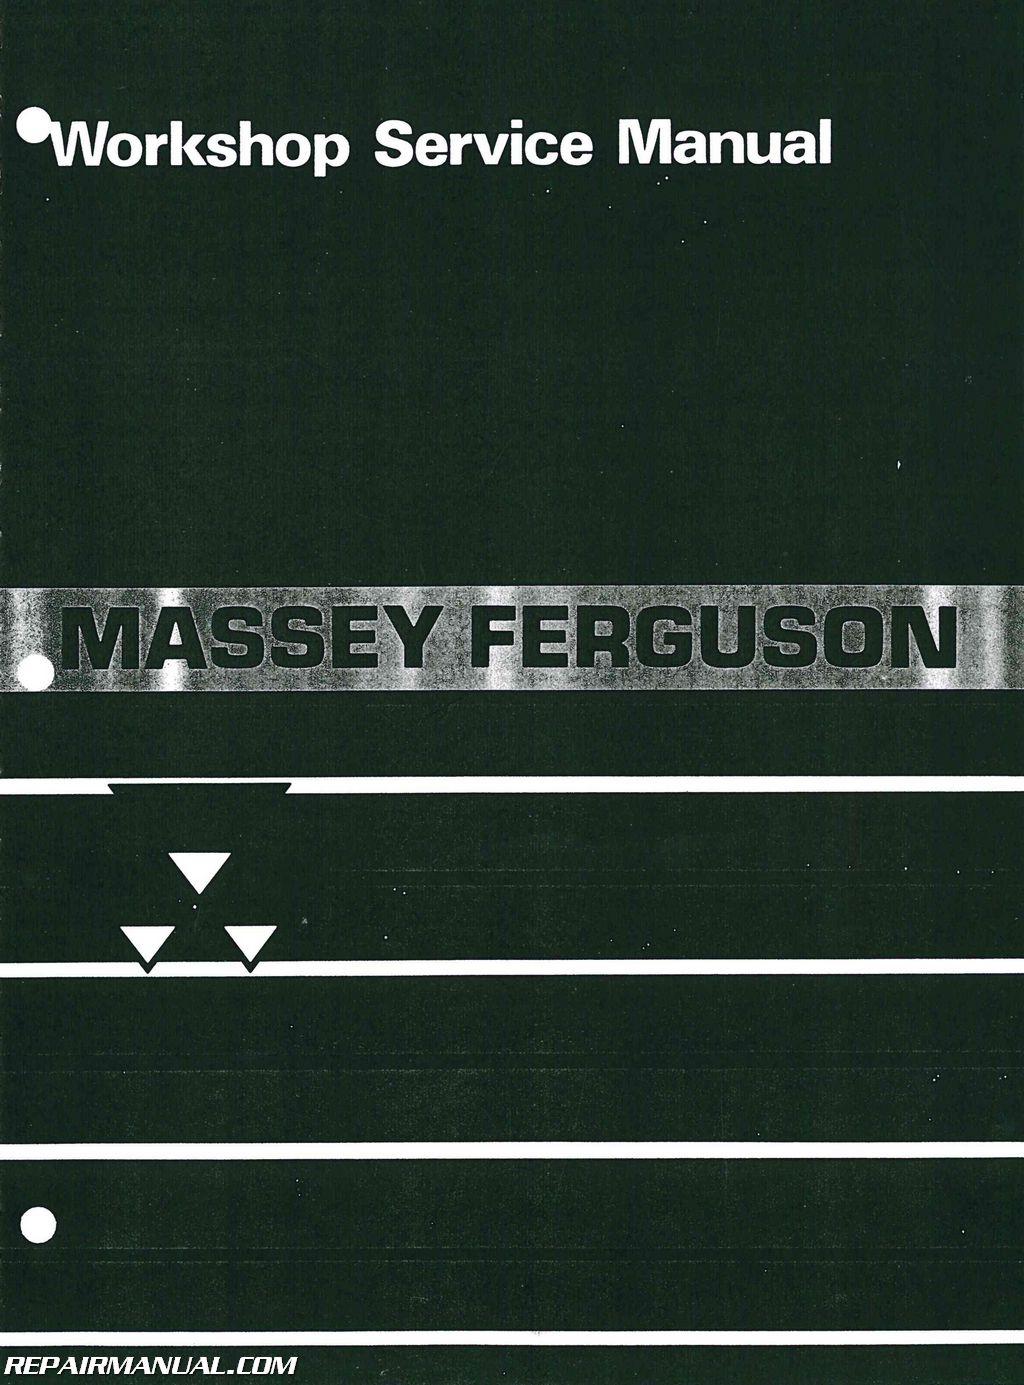 hight resolution of massey ferguson mf230 mf240 mf250 mf253 mf270 mf290 mf298 service manual jpg